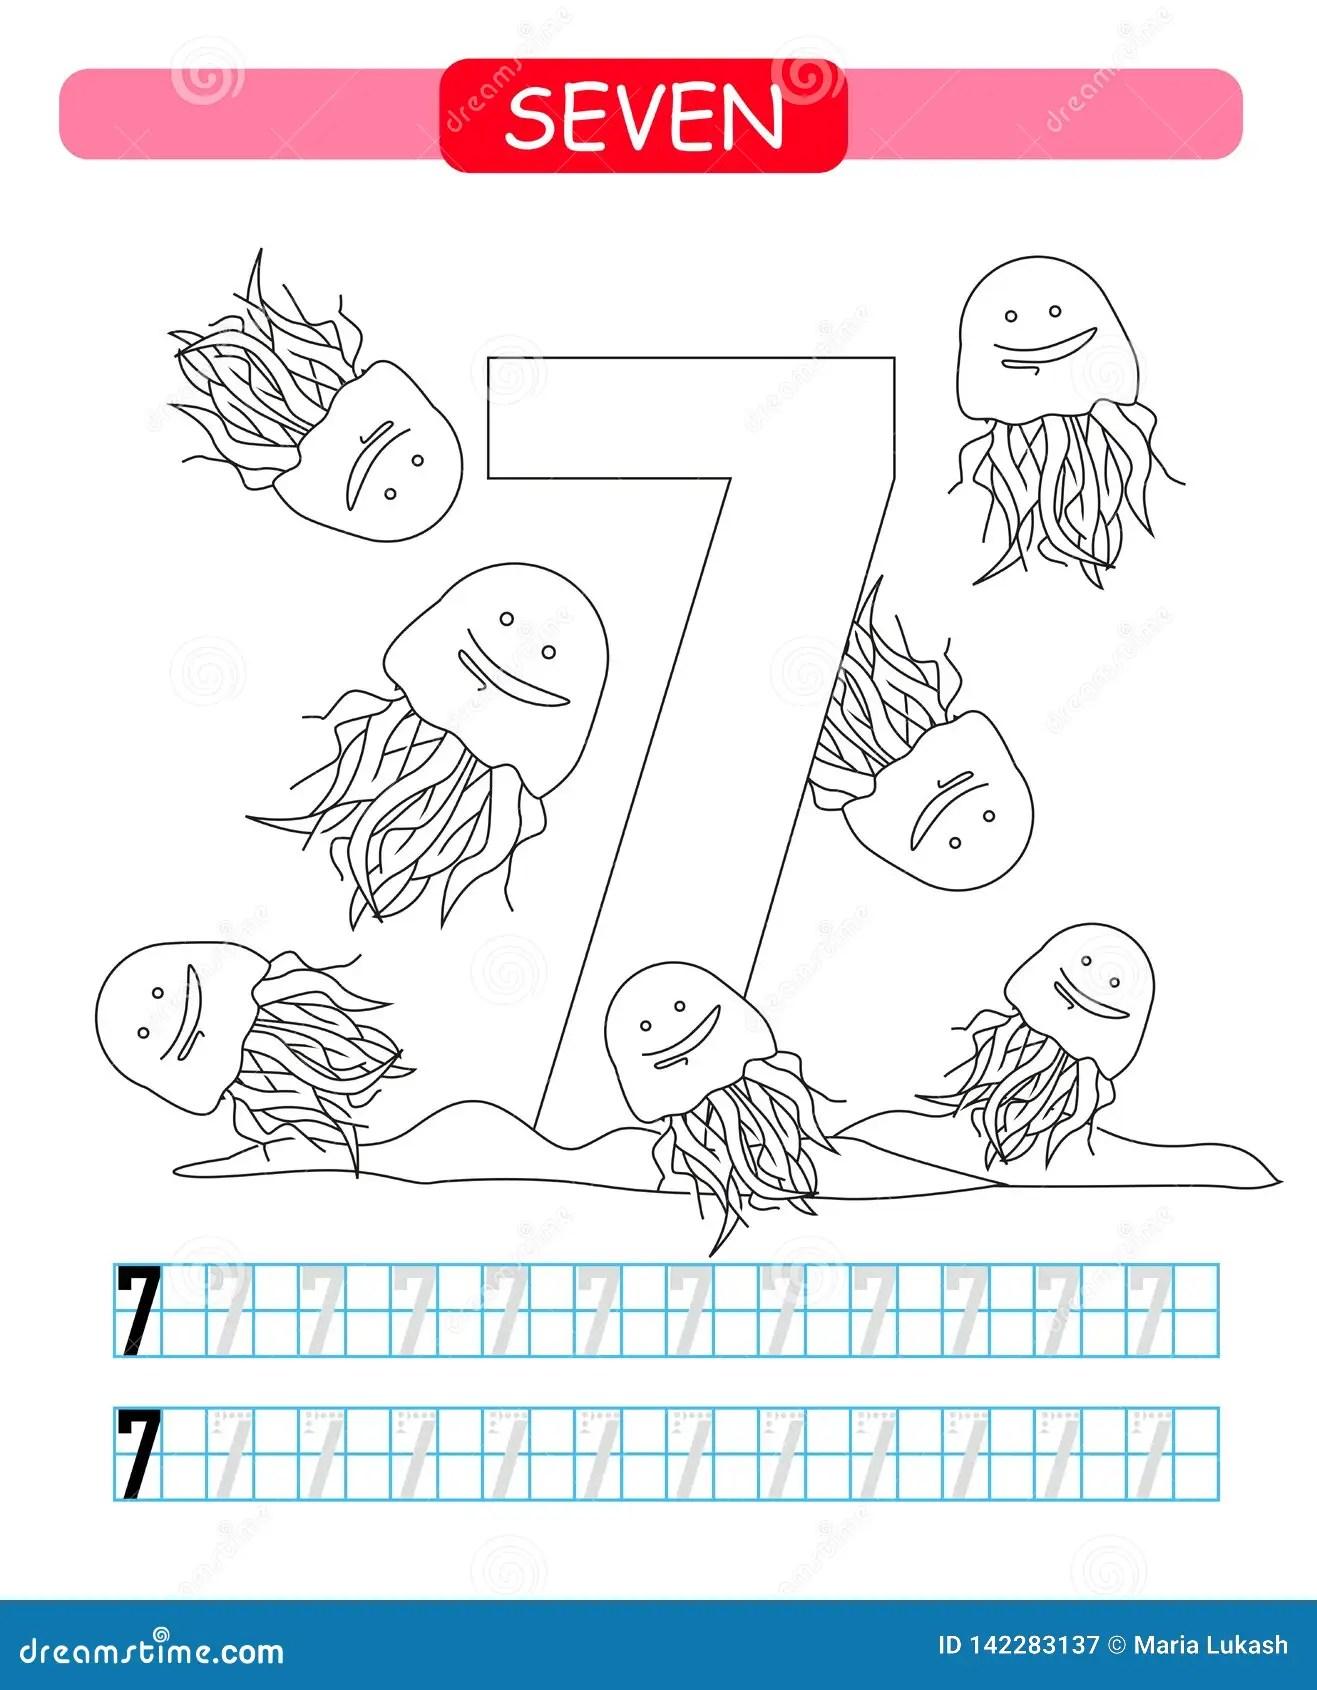 Seven Learning Number 7 Coloring Printable Worksheet For